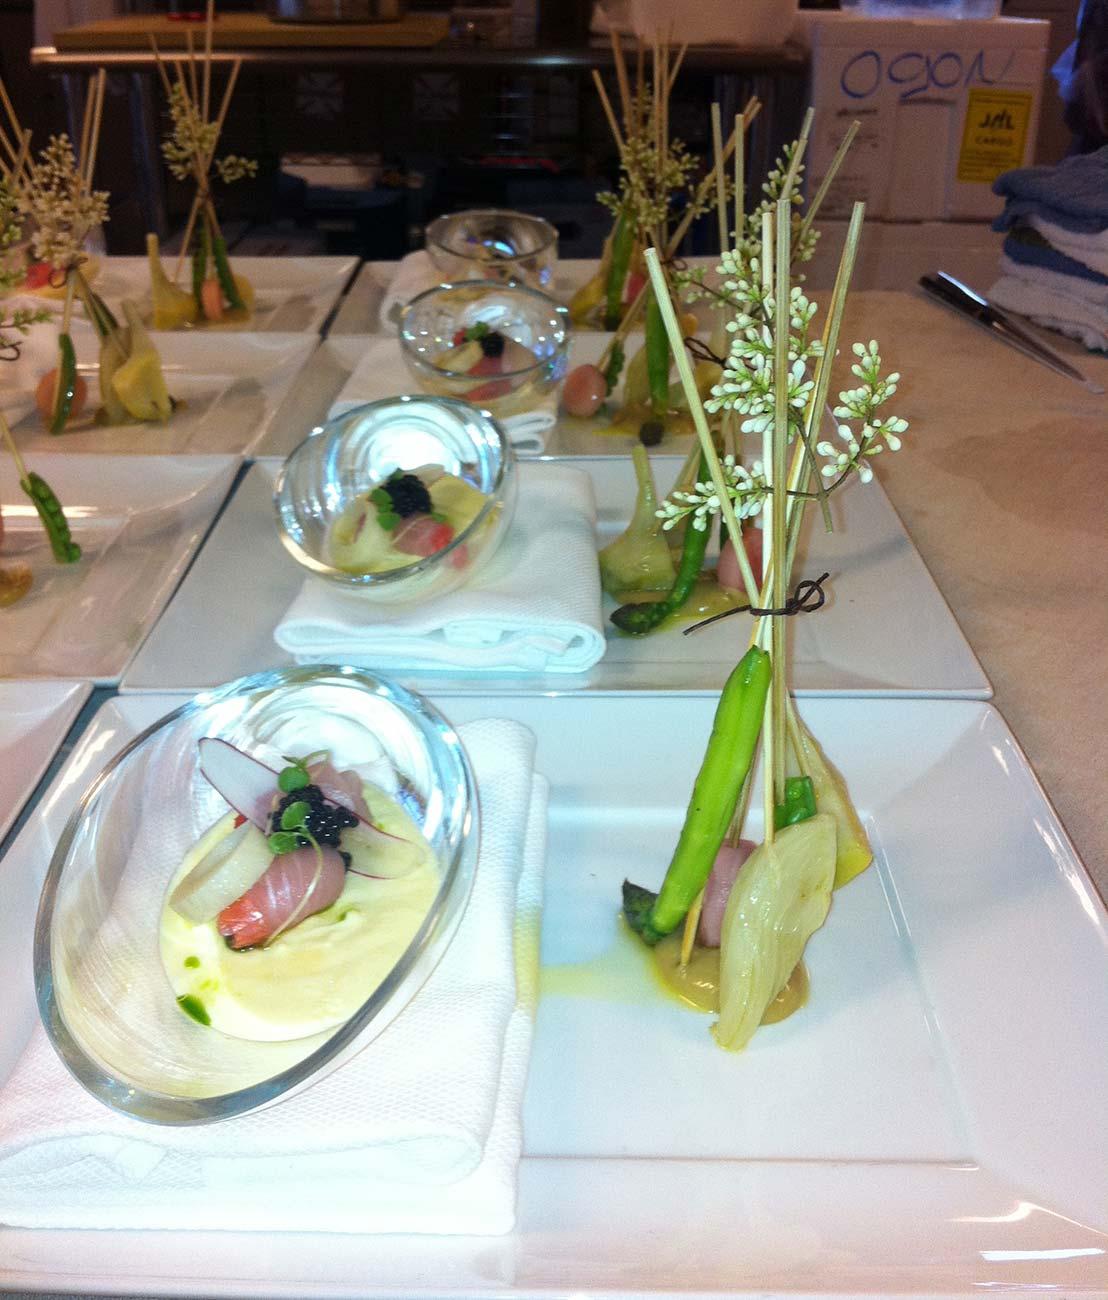 Plates of gourmet food